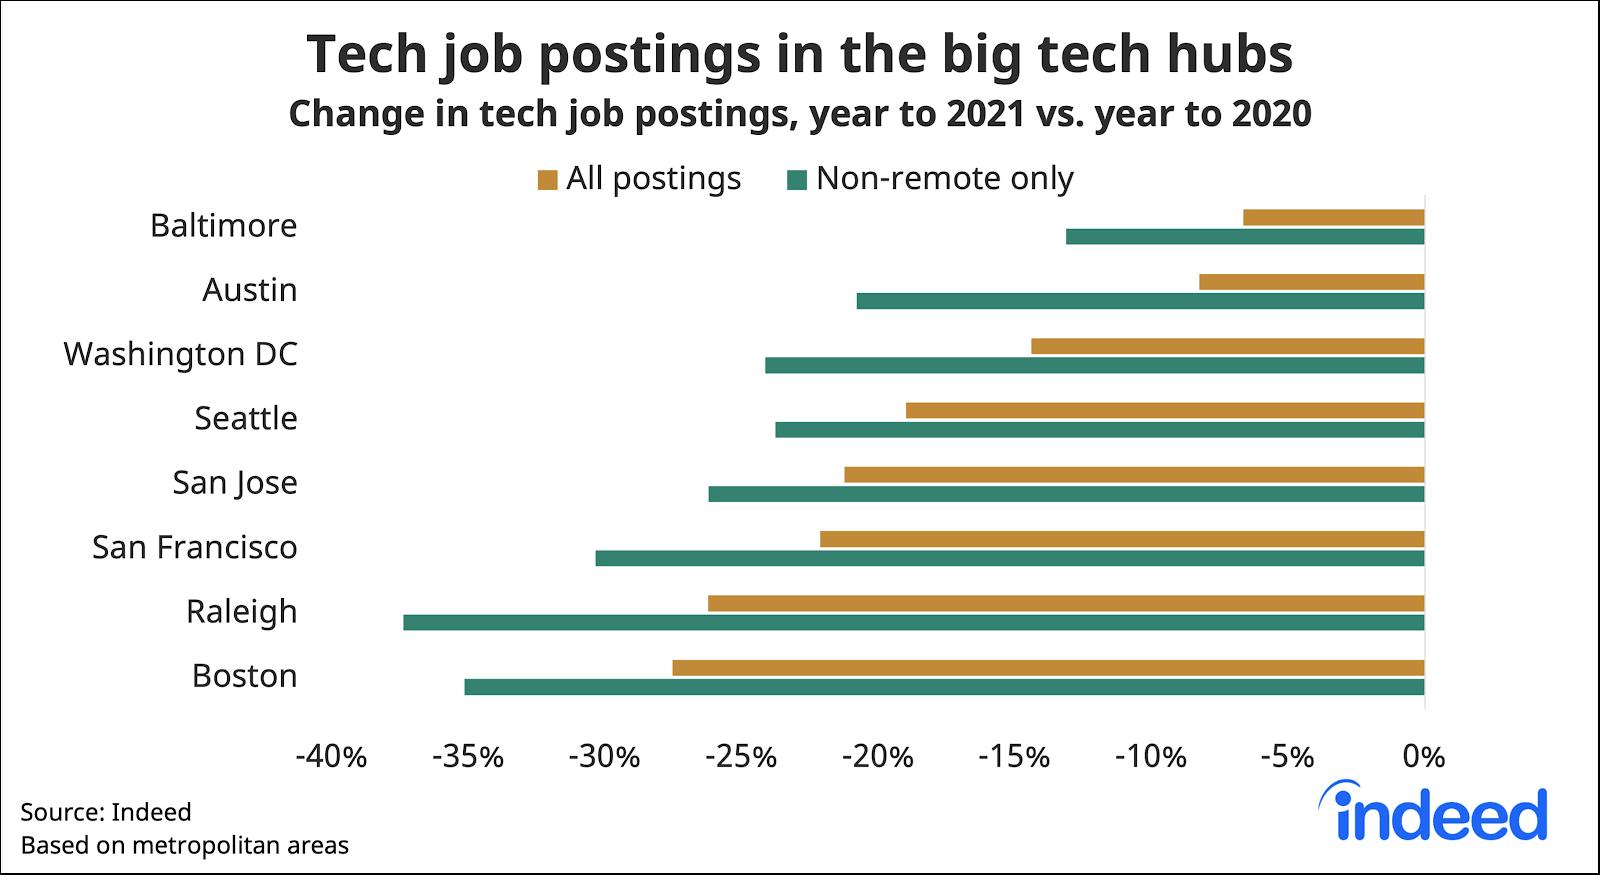 Bar graph showing tech job postings in the big tech hubs